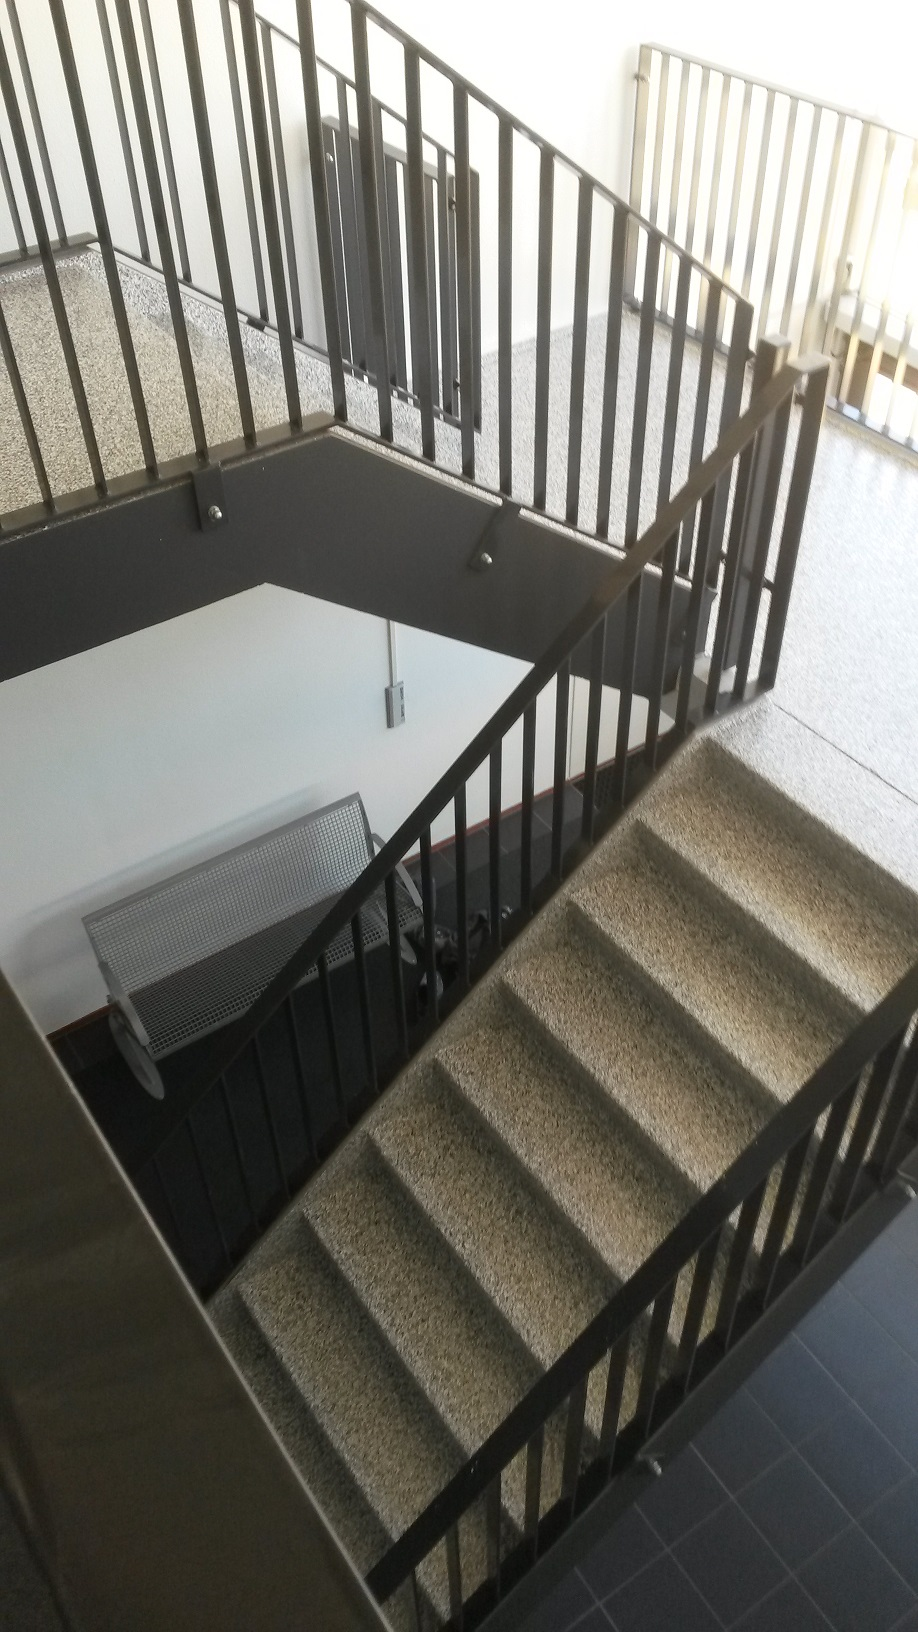 De Vve Flakestrap - trappen - in-exterieur - Appartementeneigenaar.nl